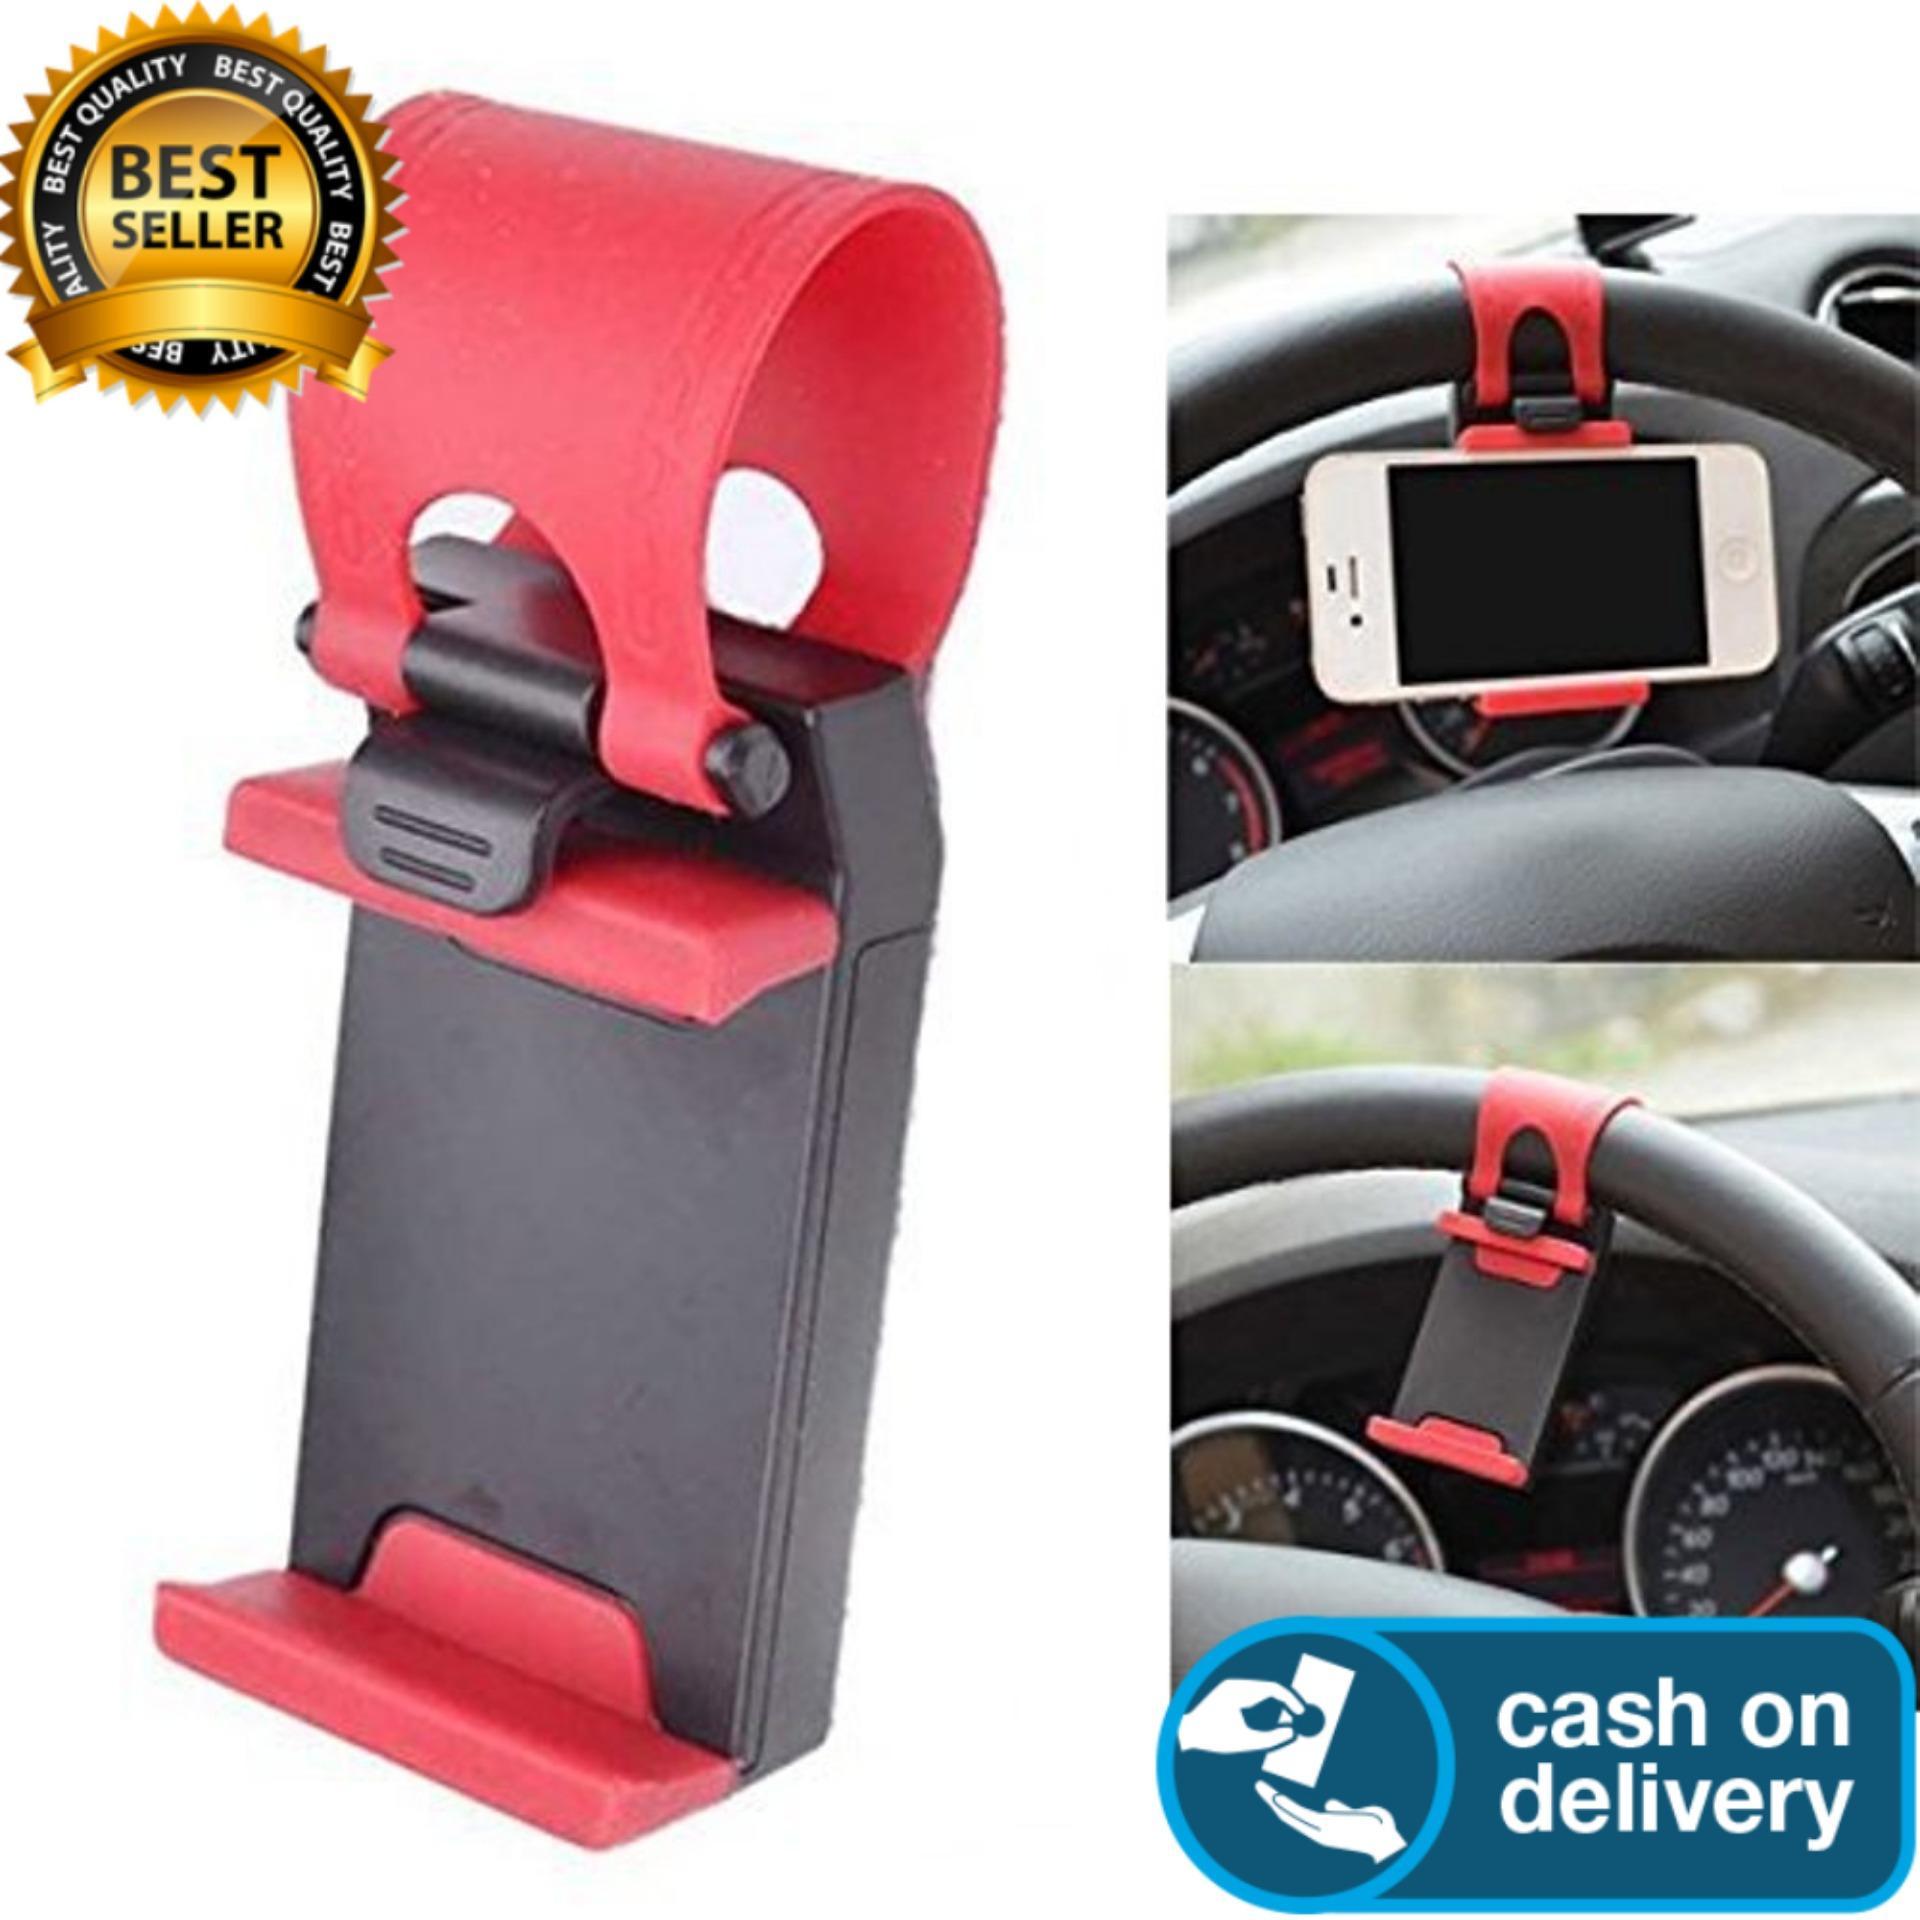 Car Holder Stir Mobil Setir Update Daftar Harga Handphone Tempel Kemudi Smartphone Hp Gps Goog Hybrid Tech Steer